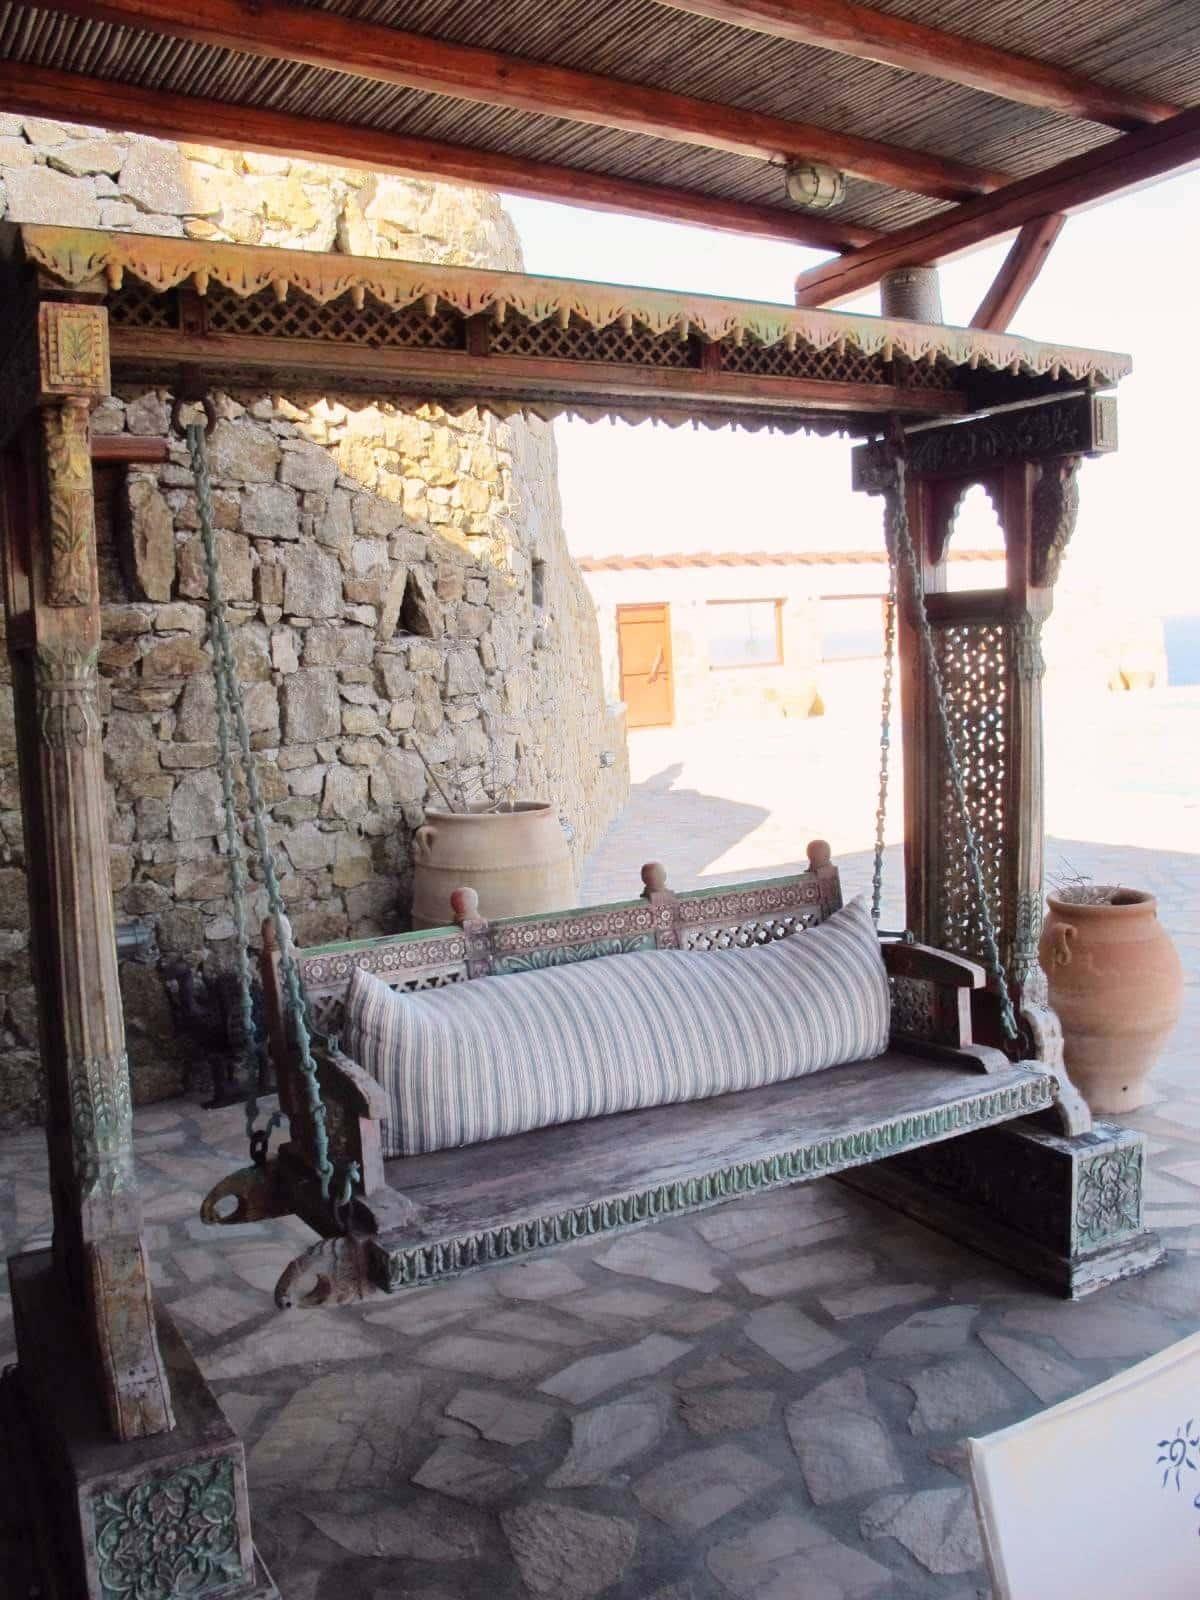 luxurious villa Mykonos - πολυτελής βίλα Μύκονος - mykonos services - οικοδομικές εργασίες 4